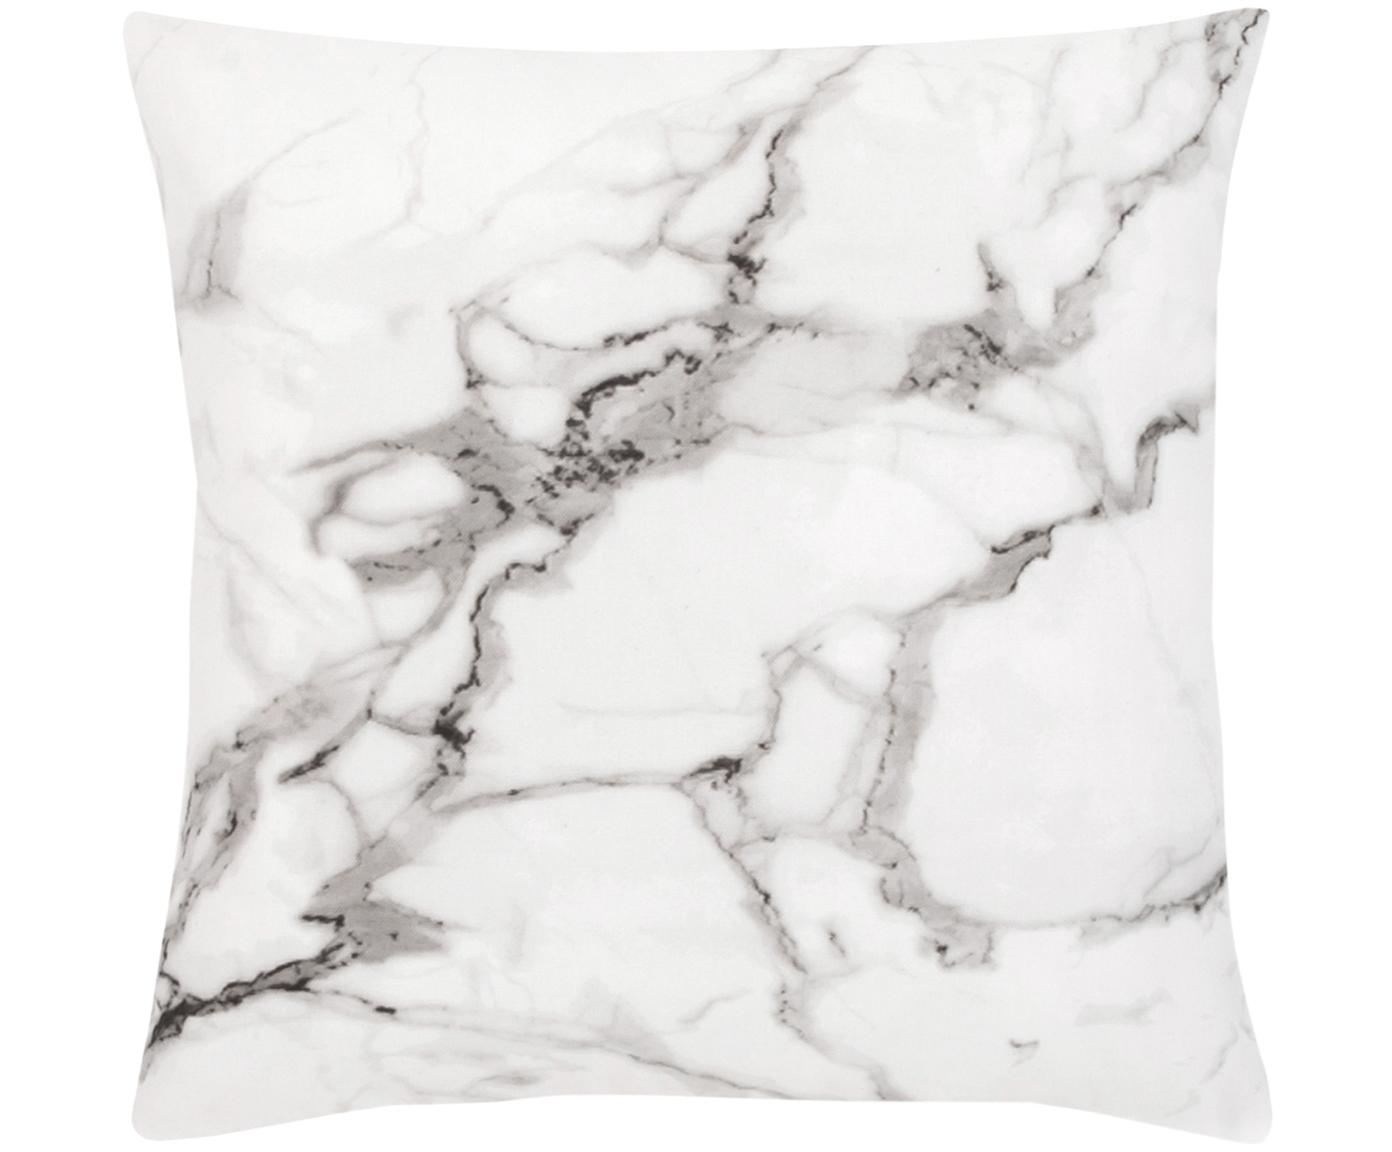 Kissenhülle Malin mit Marmormuster, Webart: Perkal, Marmormuster, Weiss, 45 x 45 cm